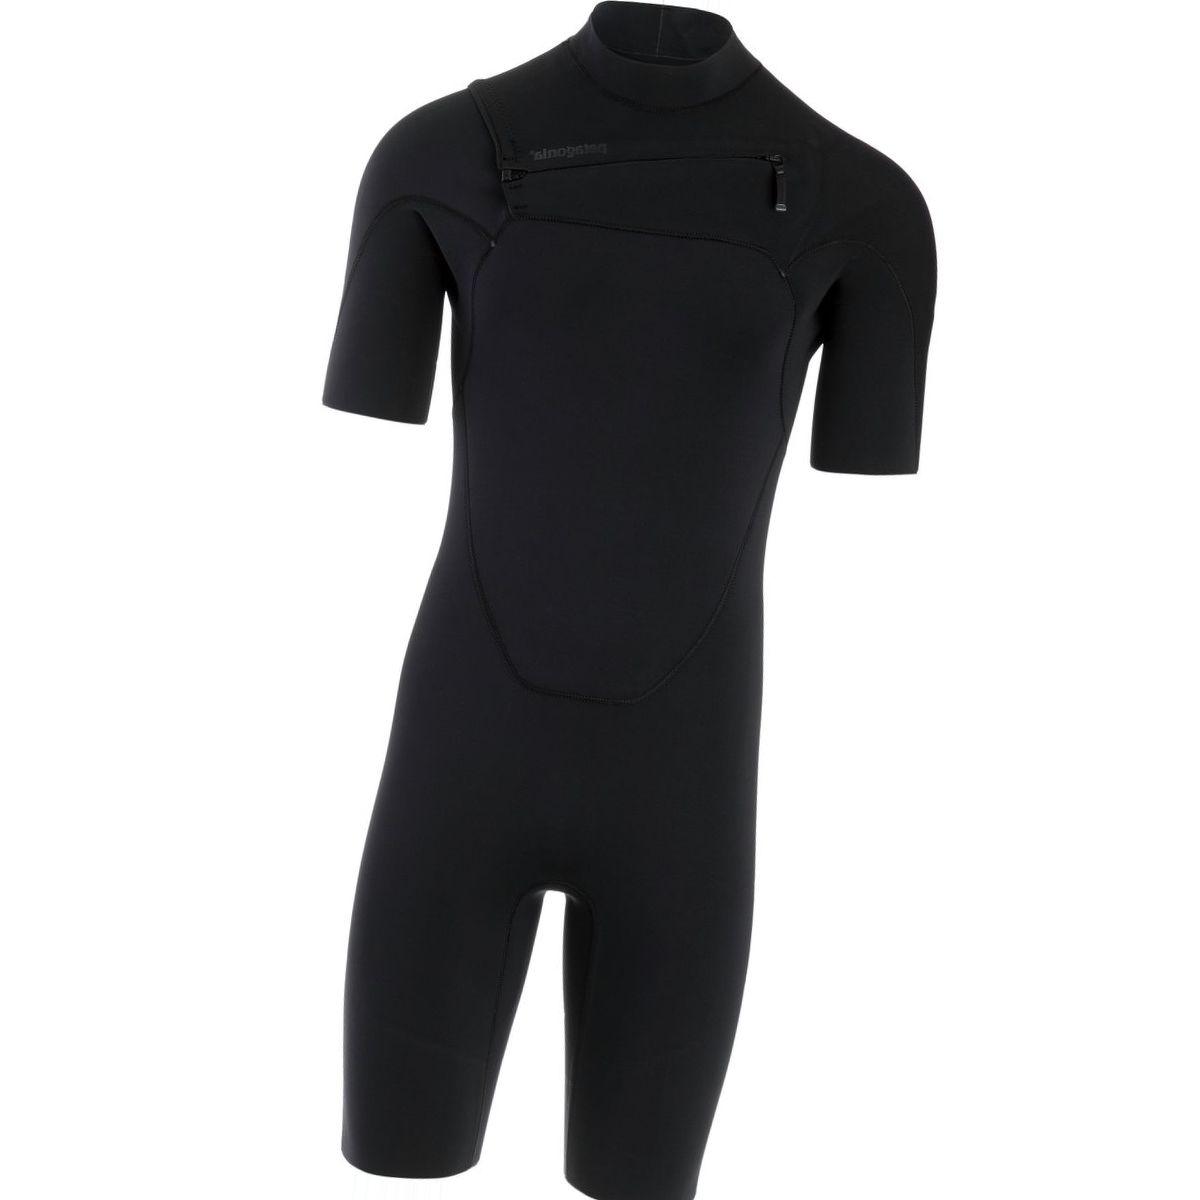 Patagonia R1 Lite Yulex Full-Zip Spring Suit - Men's